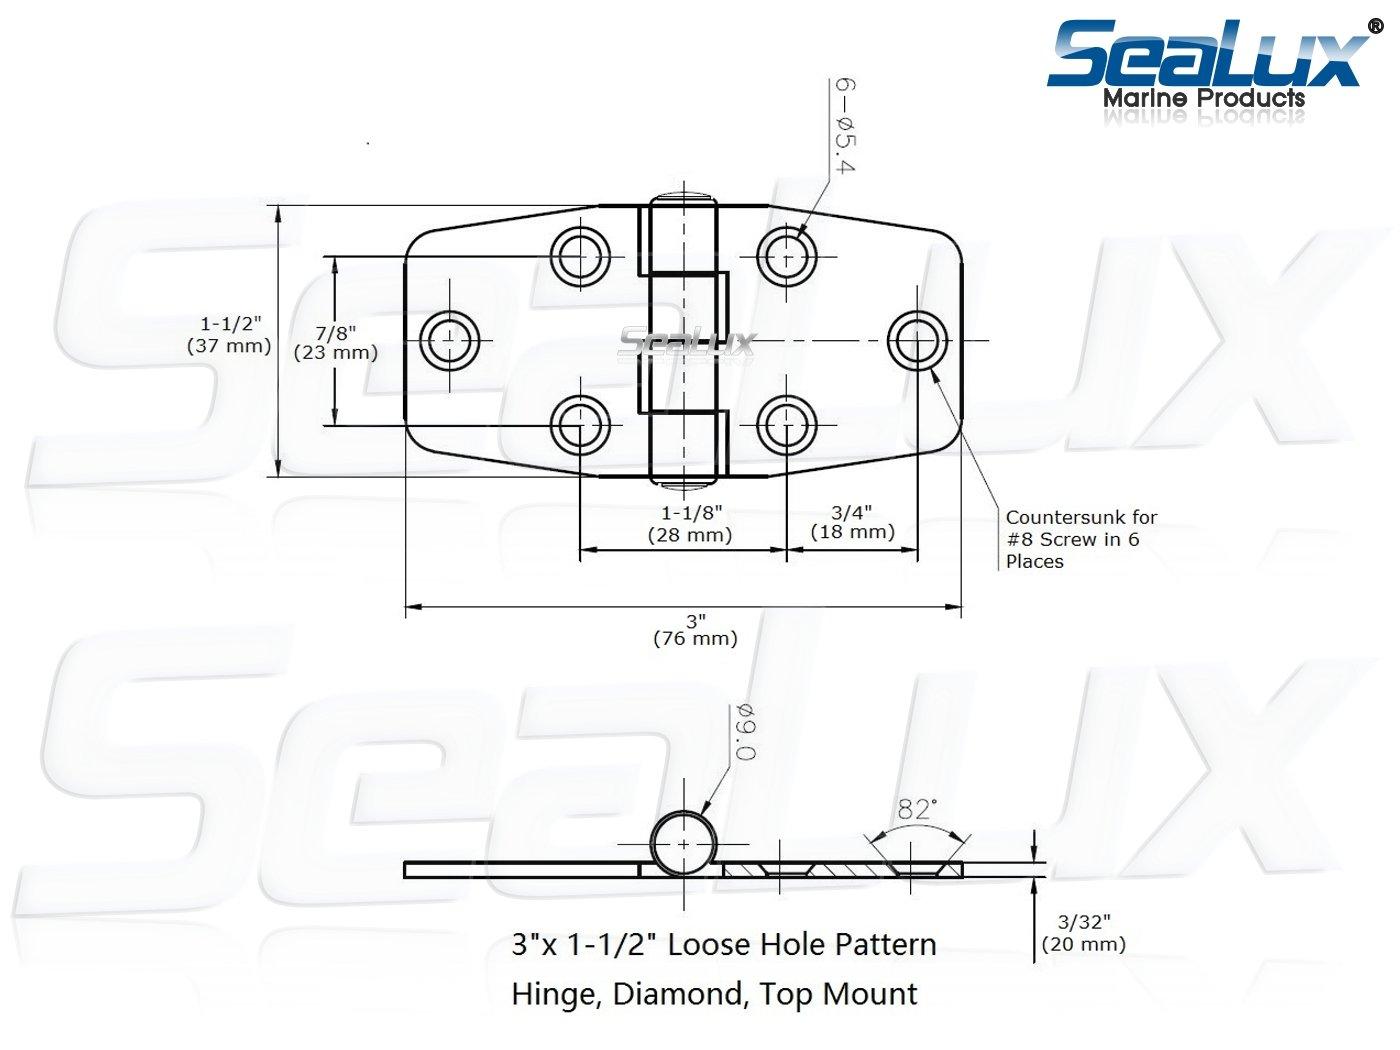 WestCo RVs SeaLux Marine Grade Stainless Steel Mirror Polished Door Hinge 3 x 1.5 for Boat Pair